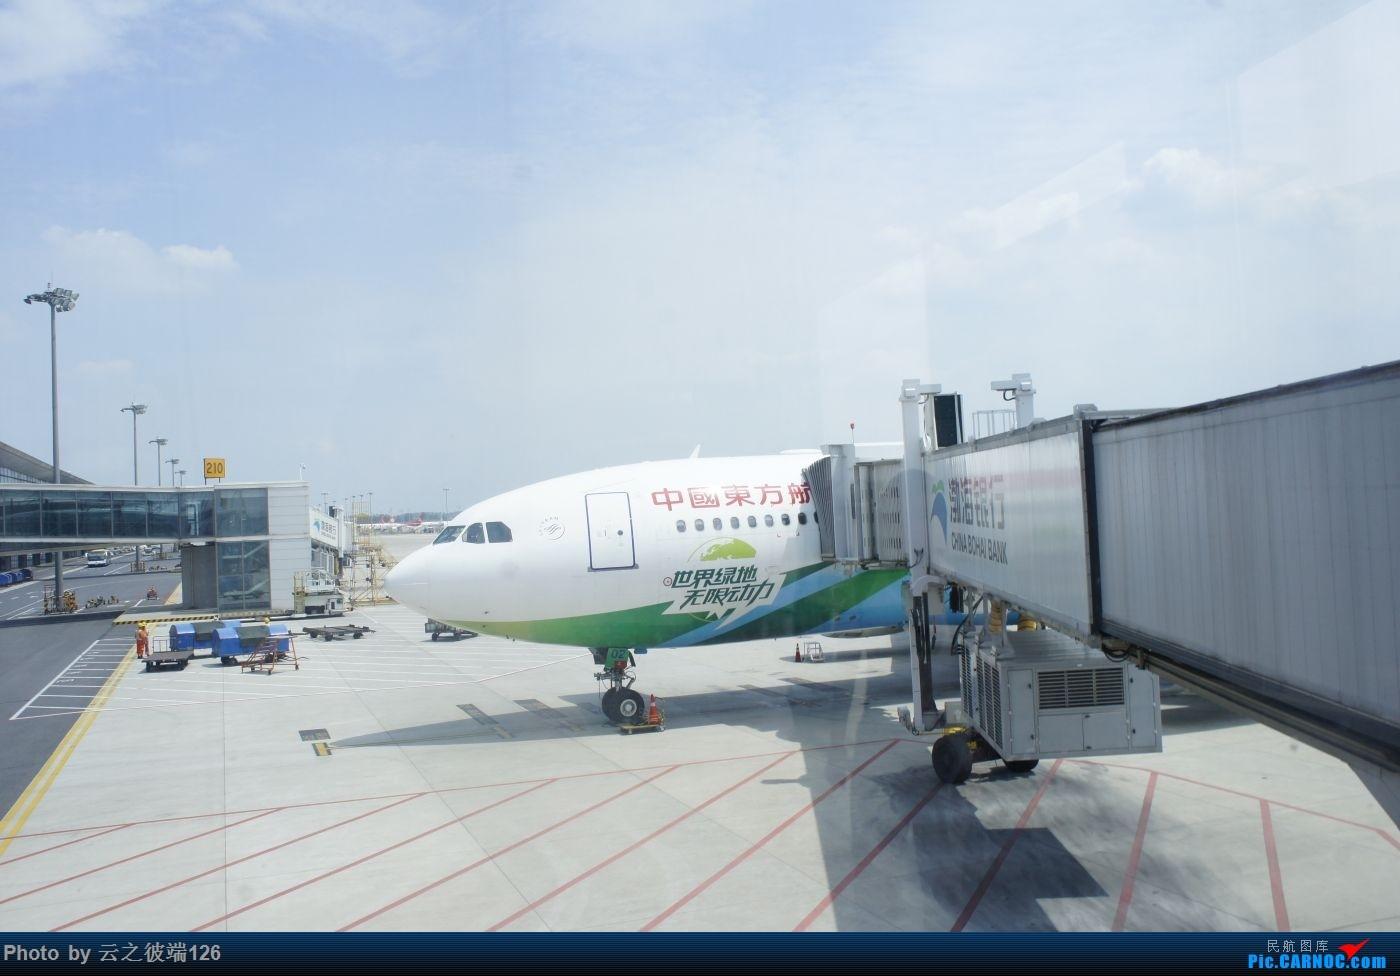 Re:[原创]KHN-CTU-JZH-CTU-NKG造访蜀地,体验世界里程最贵机票,多图 AIRBUS A330-200 B-5902 中国南京禄口国际机场